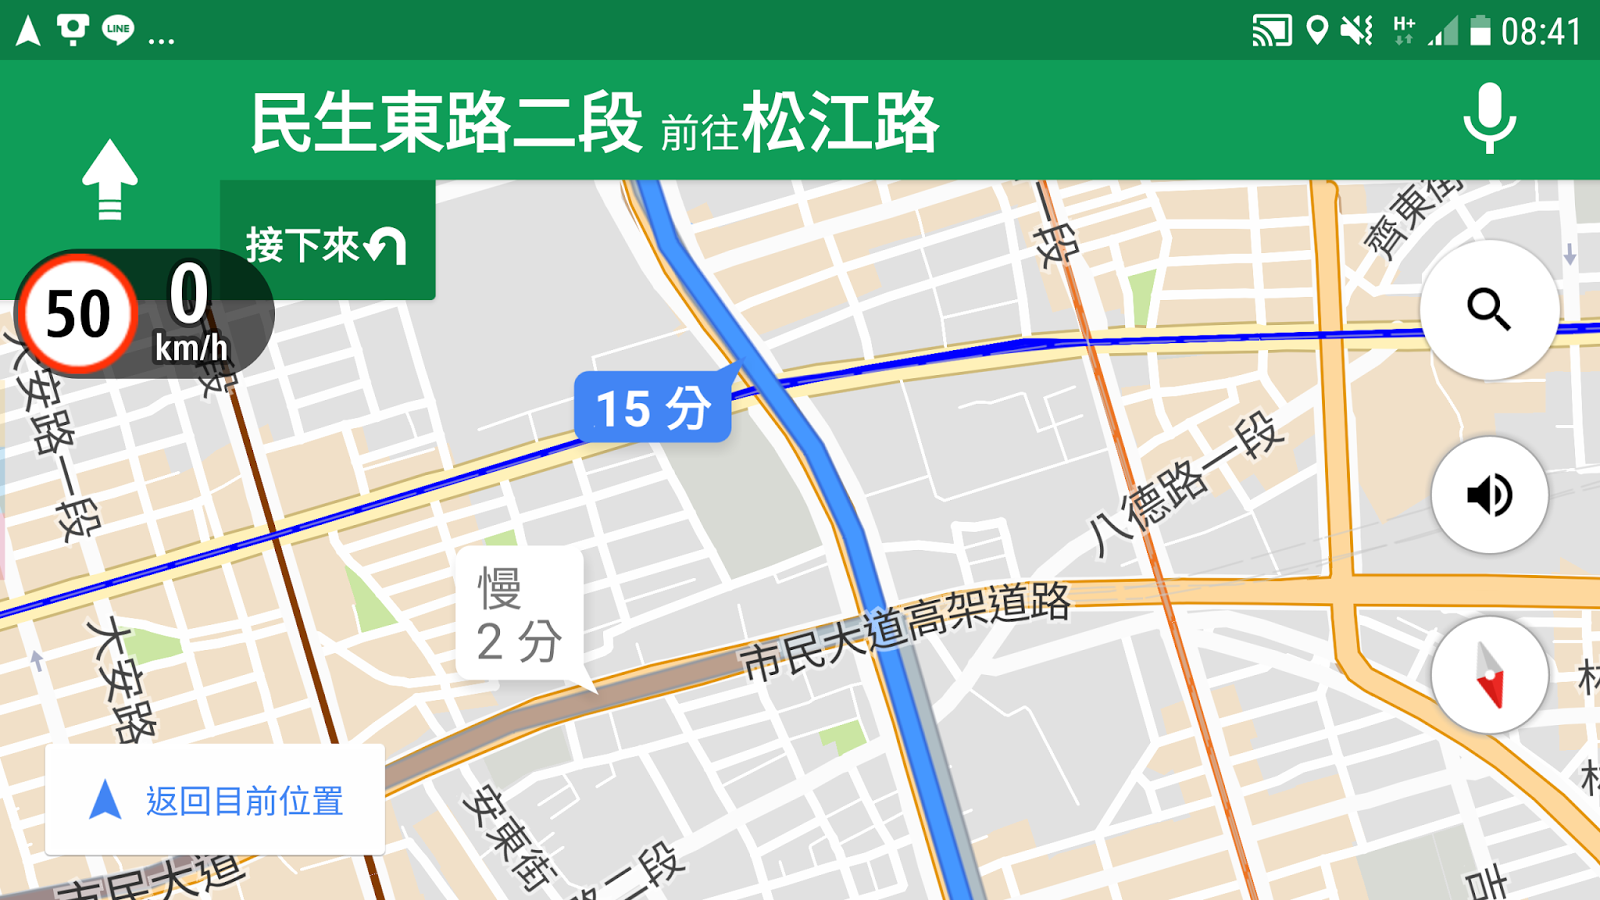 TomTom 測速照相 App:在 Google 地圖導航免費加上速限警告